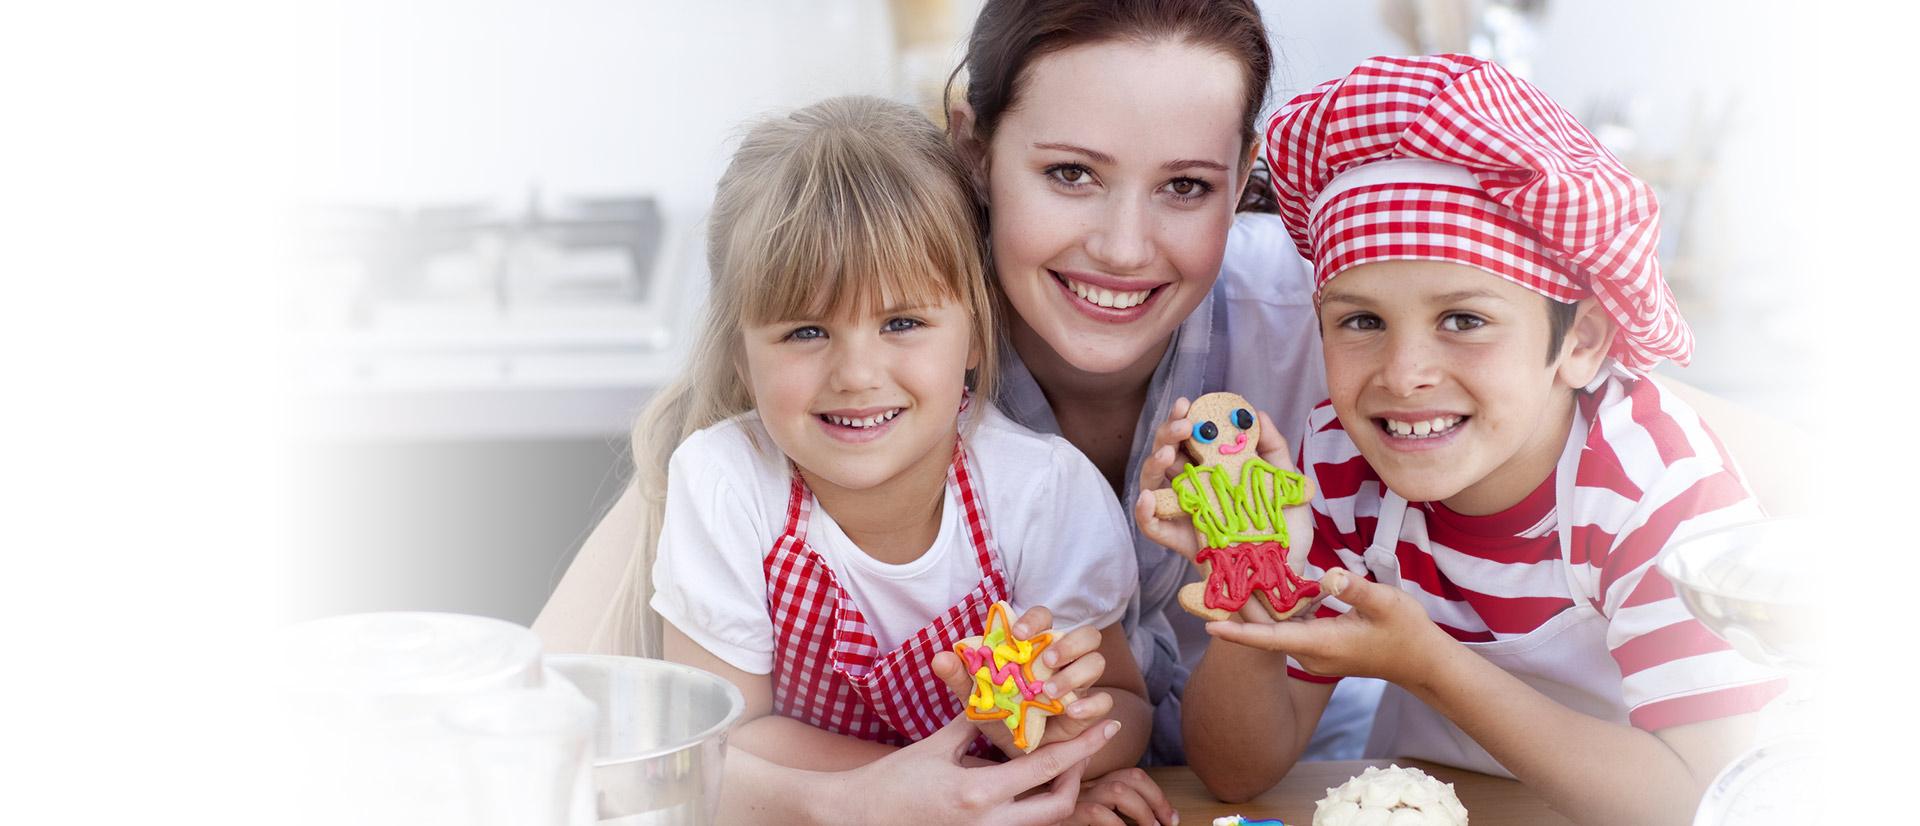 garde d'enfant, baby-sitting, aide scolaire